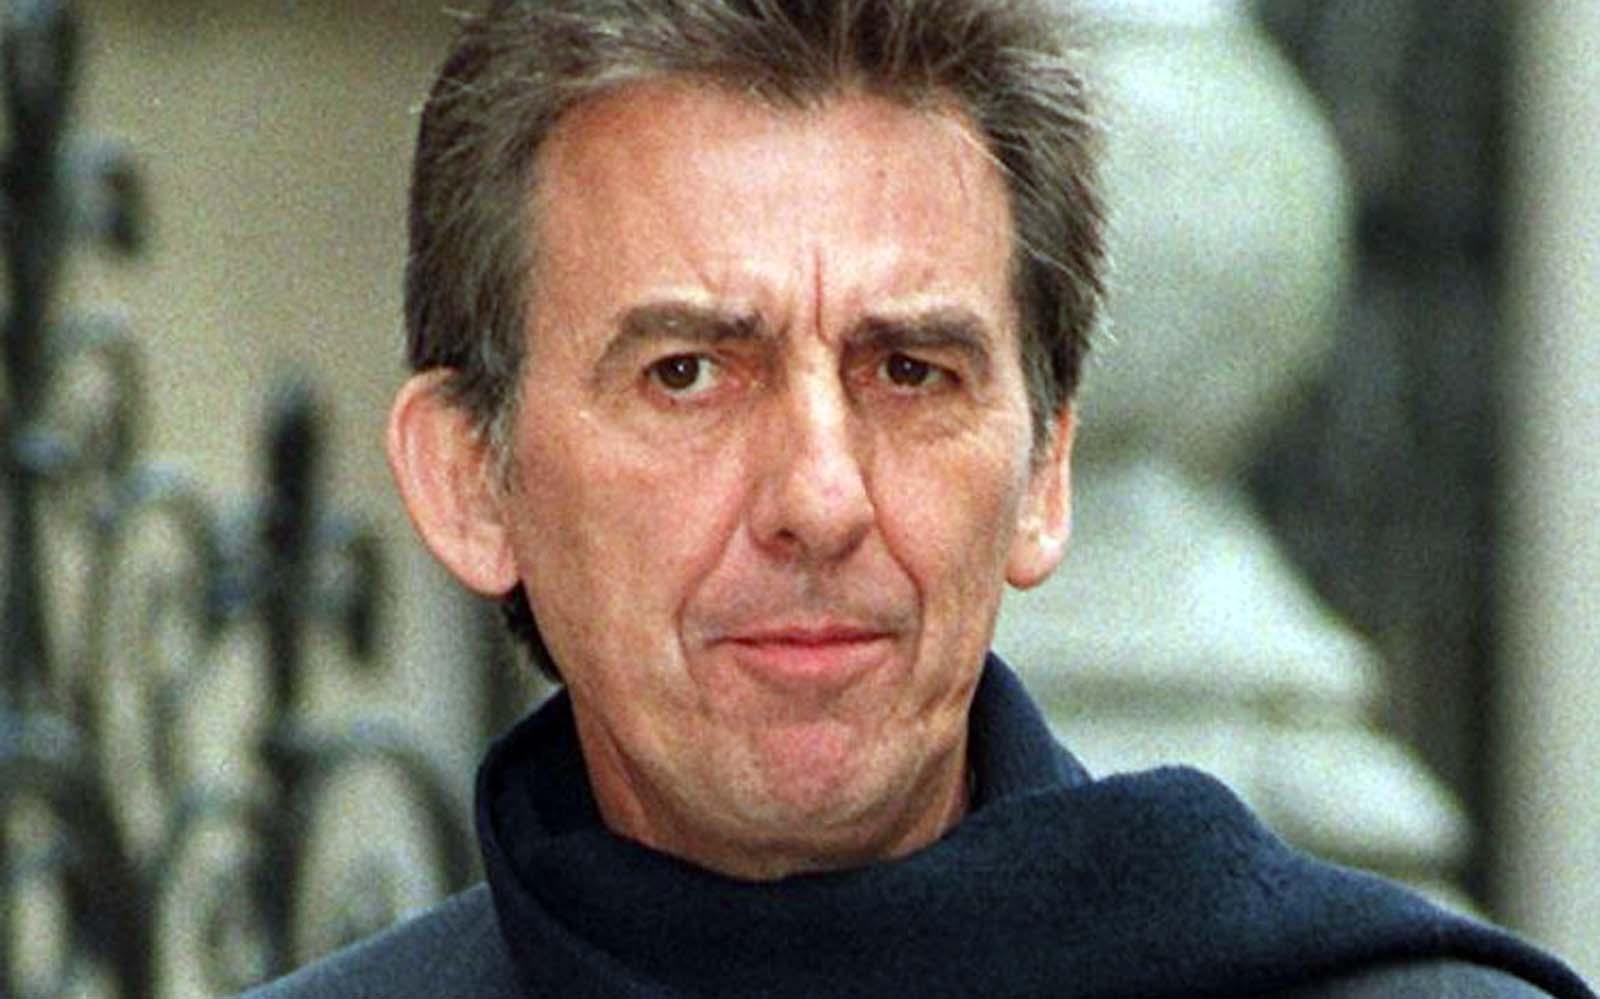 George Harrison 2001. november 29-én hunyt el Los Angelesben